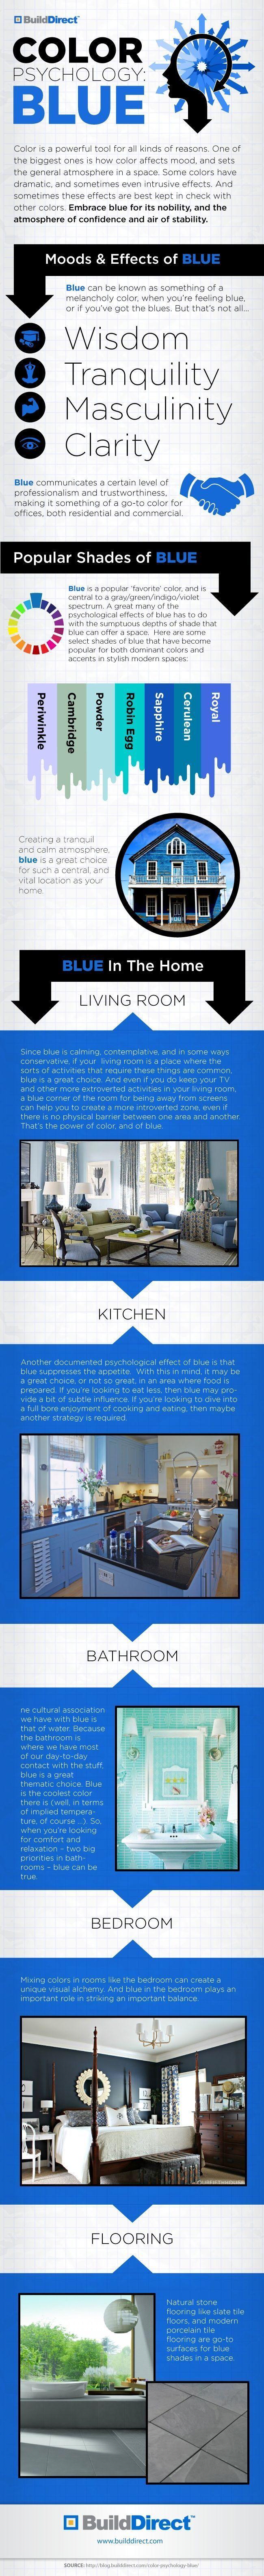 Color Psychology Blue copy Emotional Interior Design: Using Blue